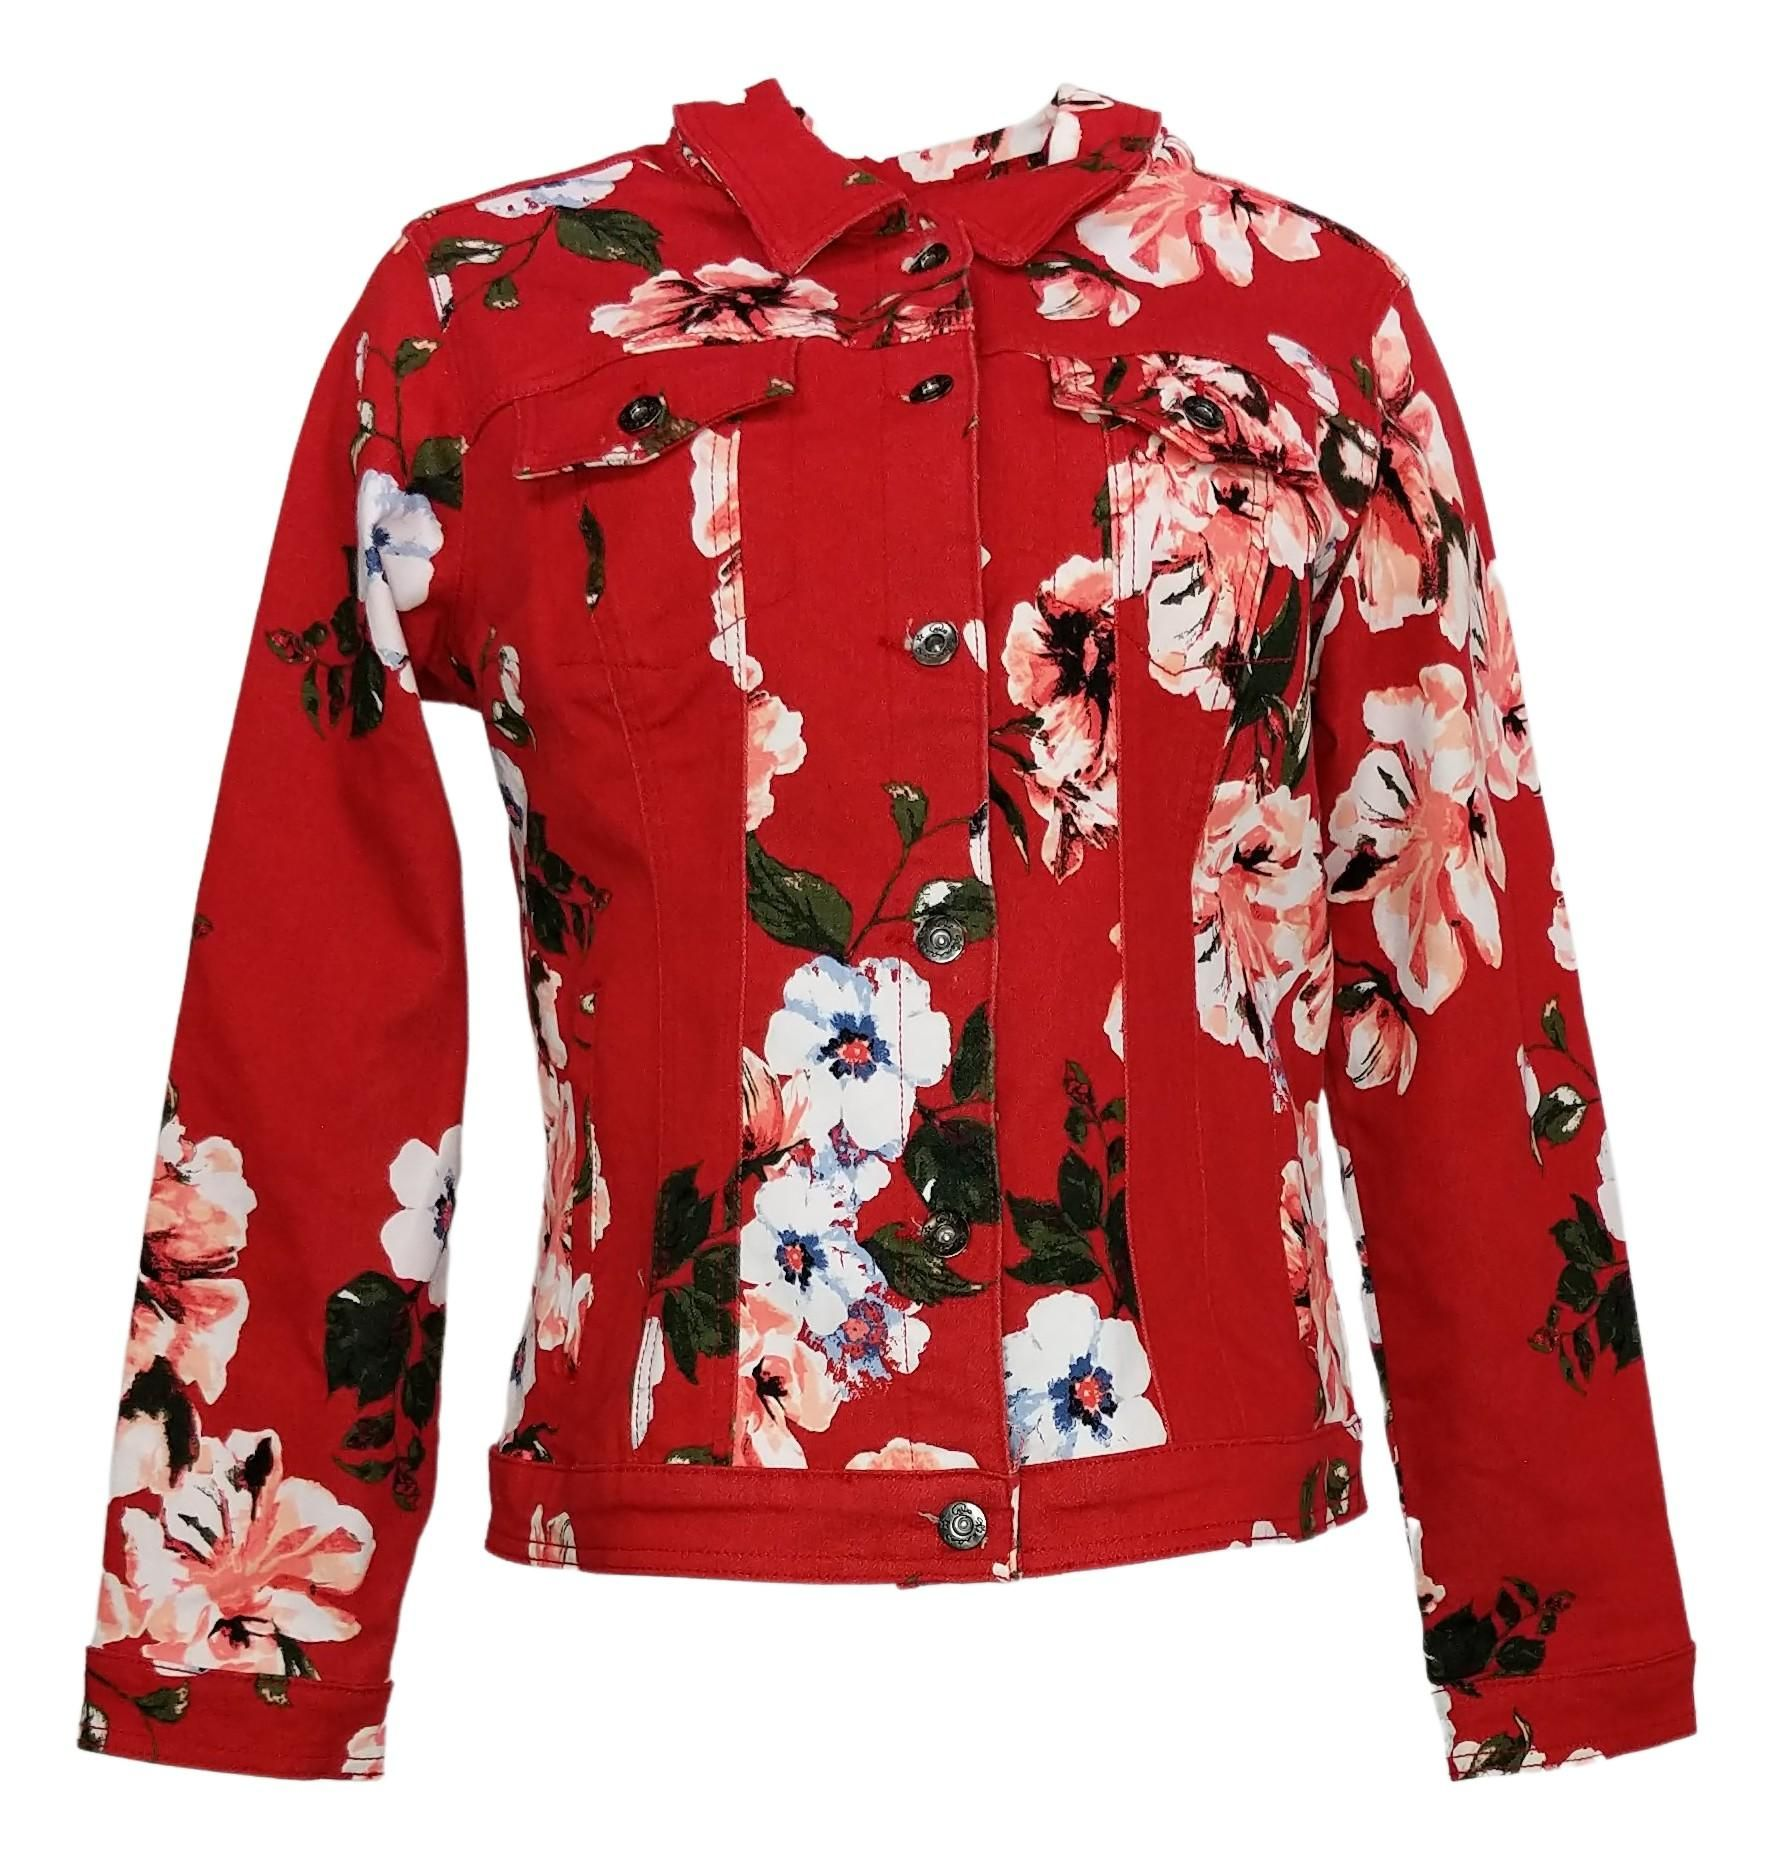 DG2 by Diane Gilman Women's Sz M Floral Print Denim Jacket Red 646504